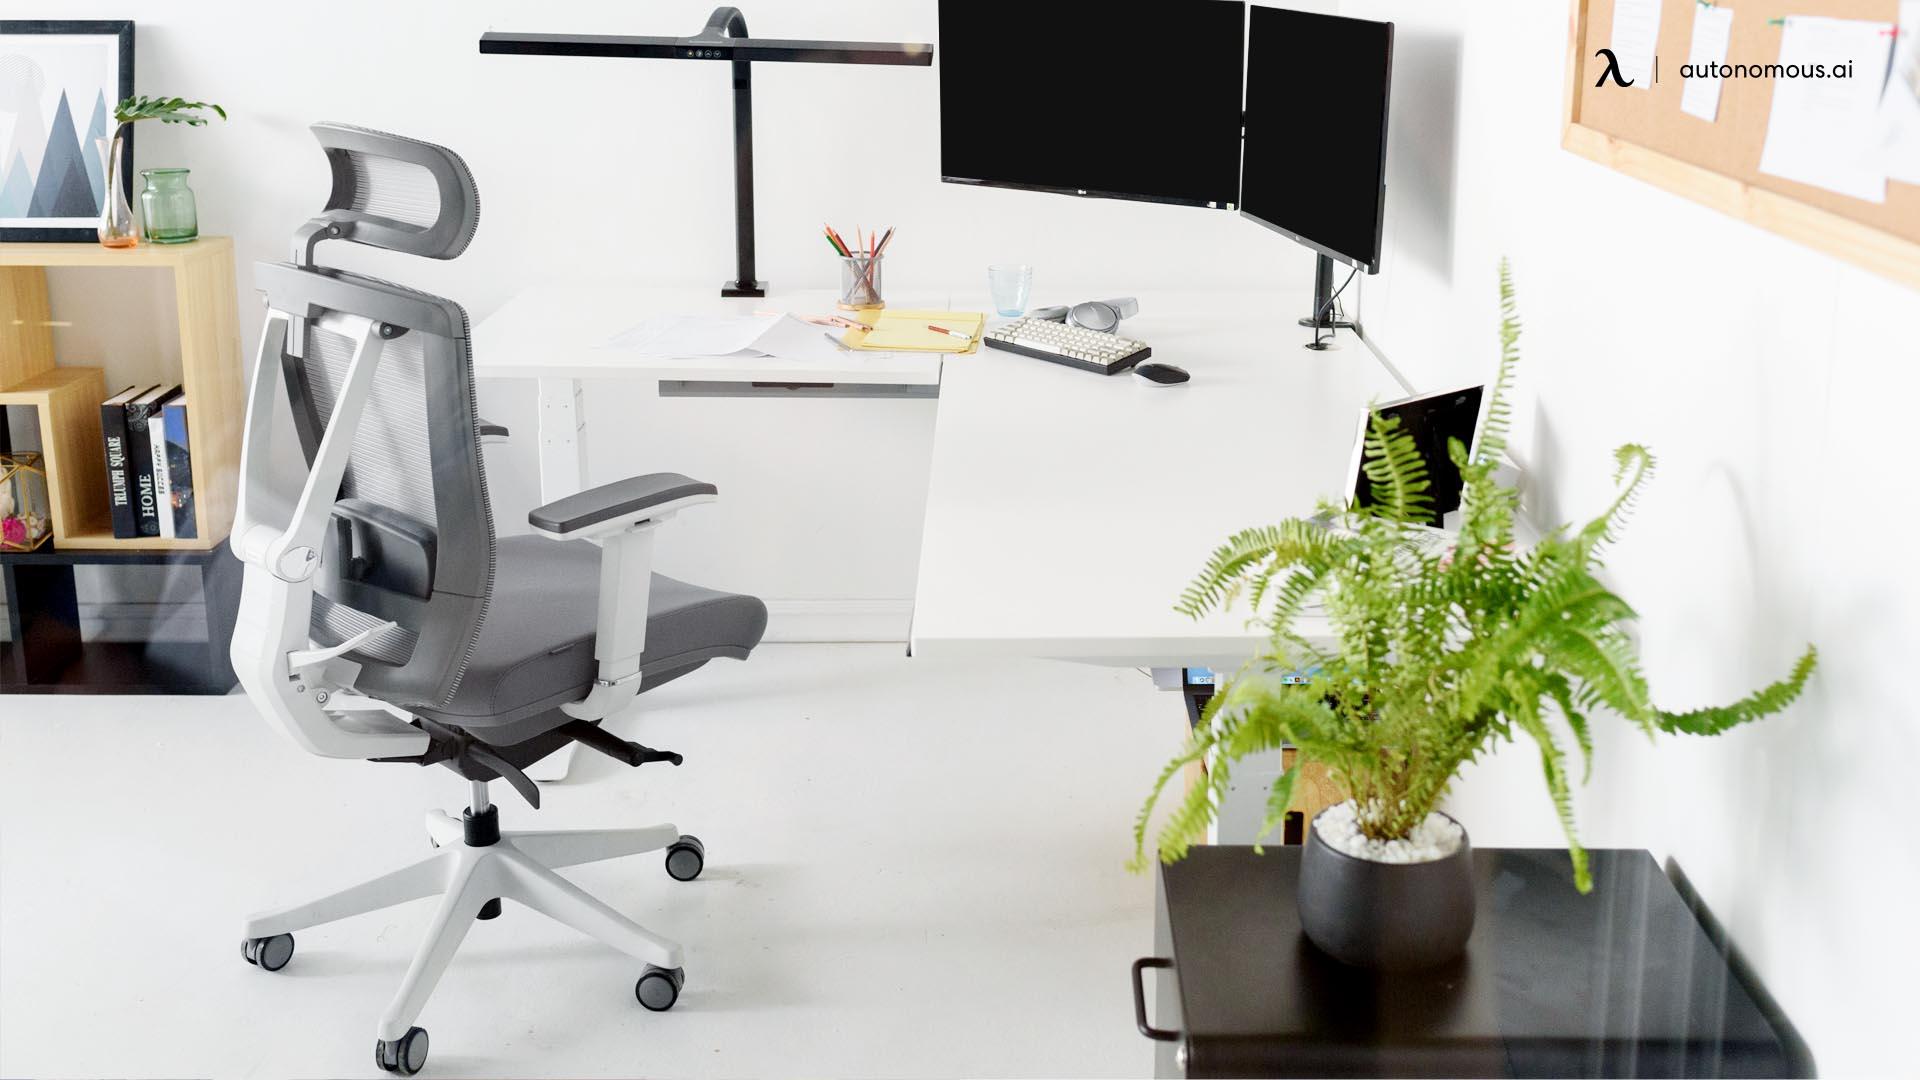 Do You Need An Ergonomic Chair?